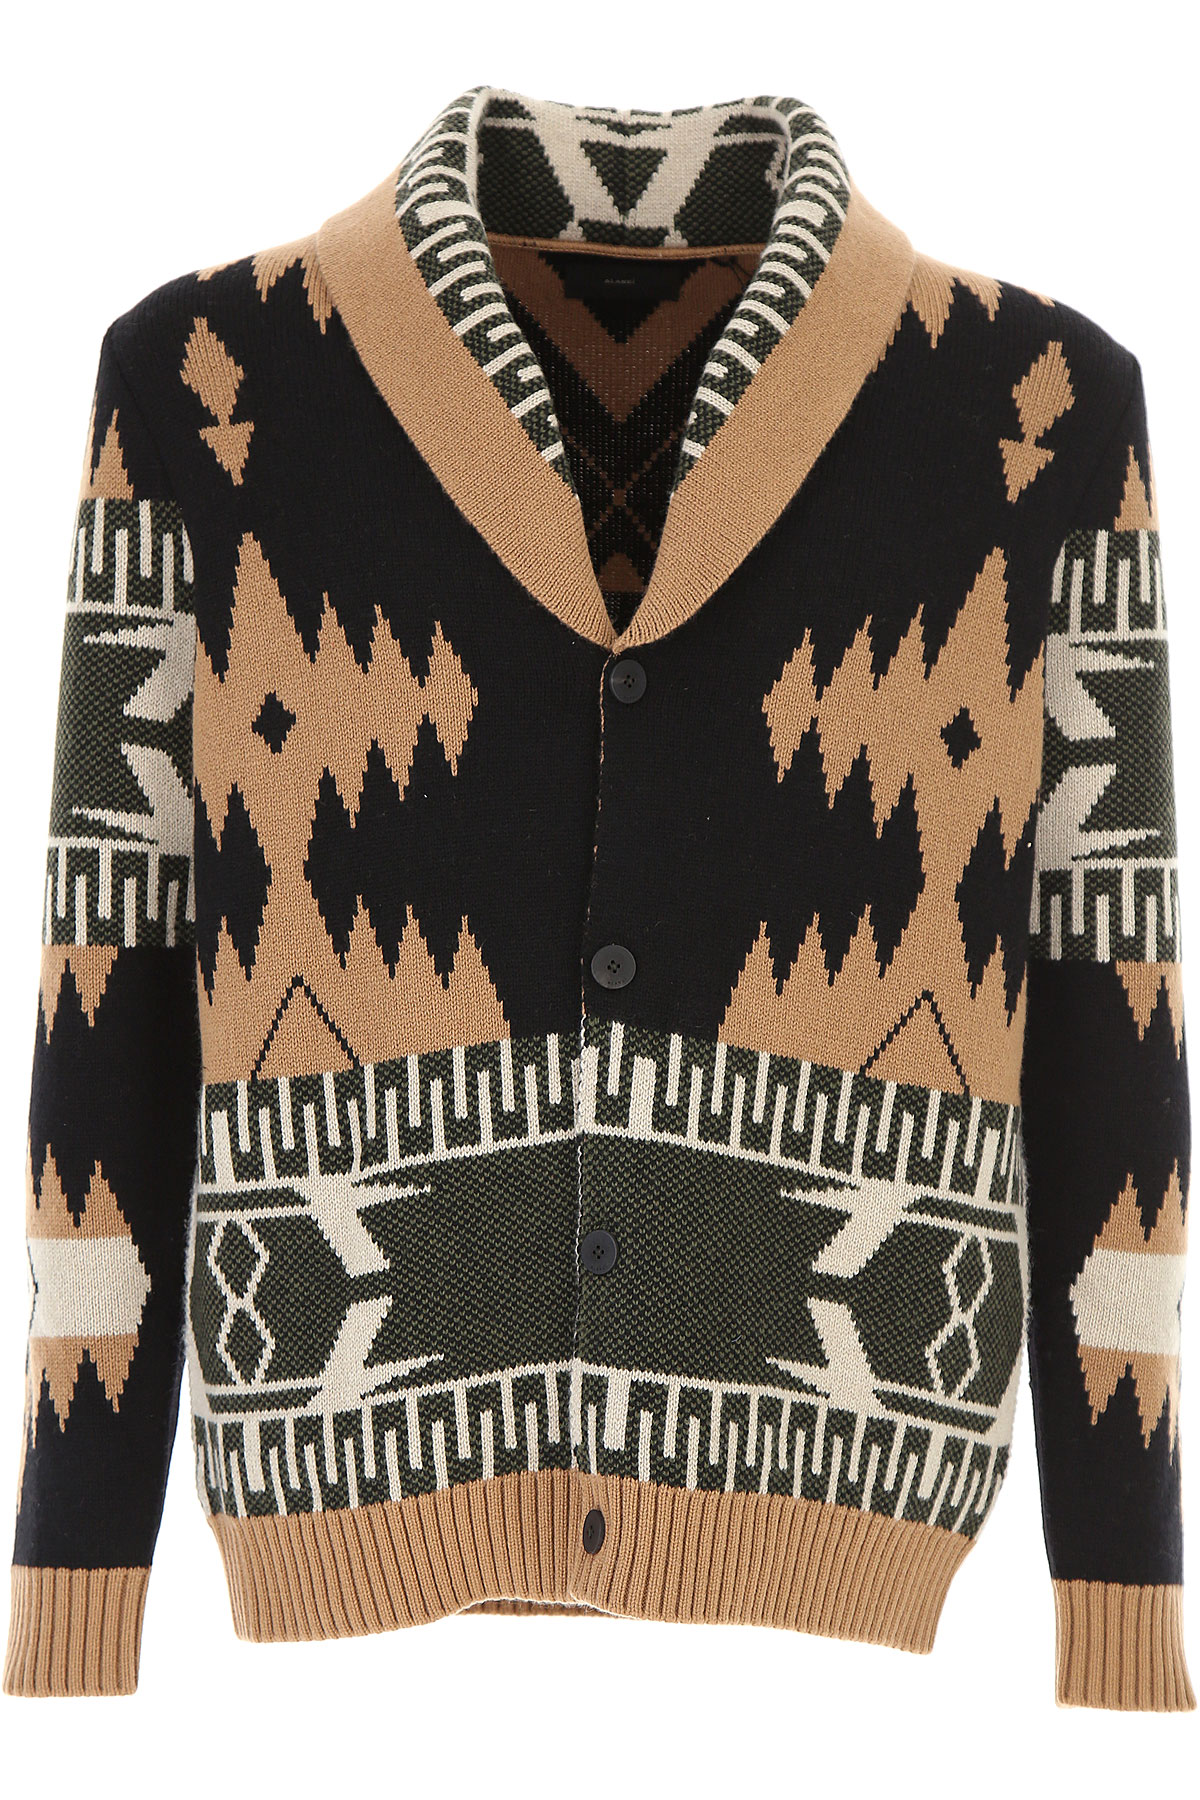 Image of ALANUI Sweater for Men Jumper, Black, Cashmere, 2017, L M